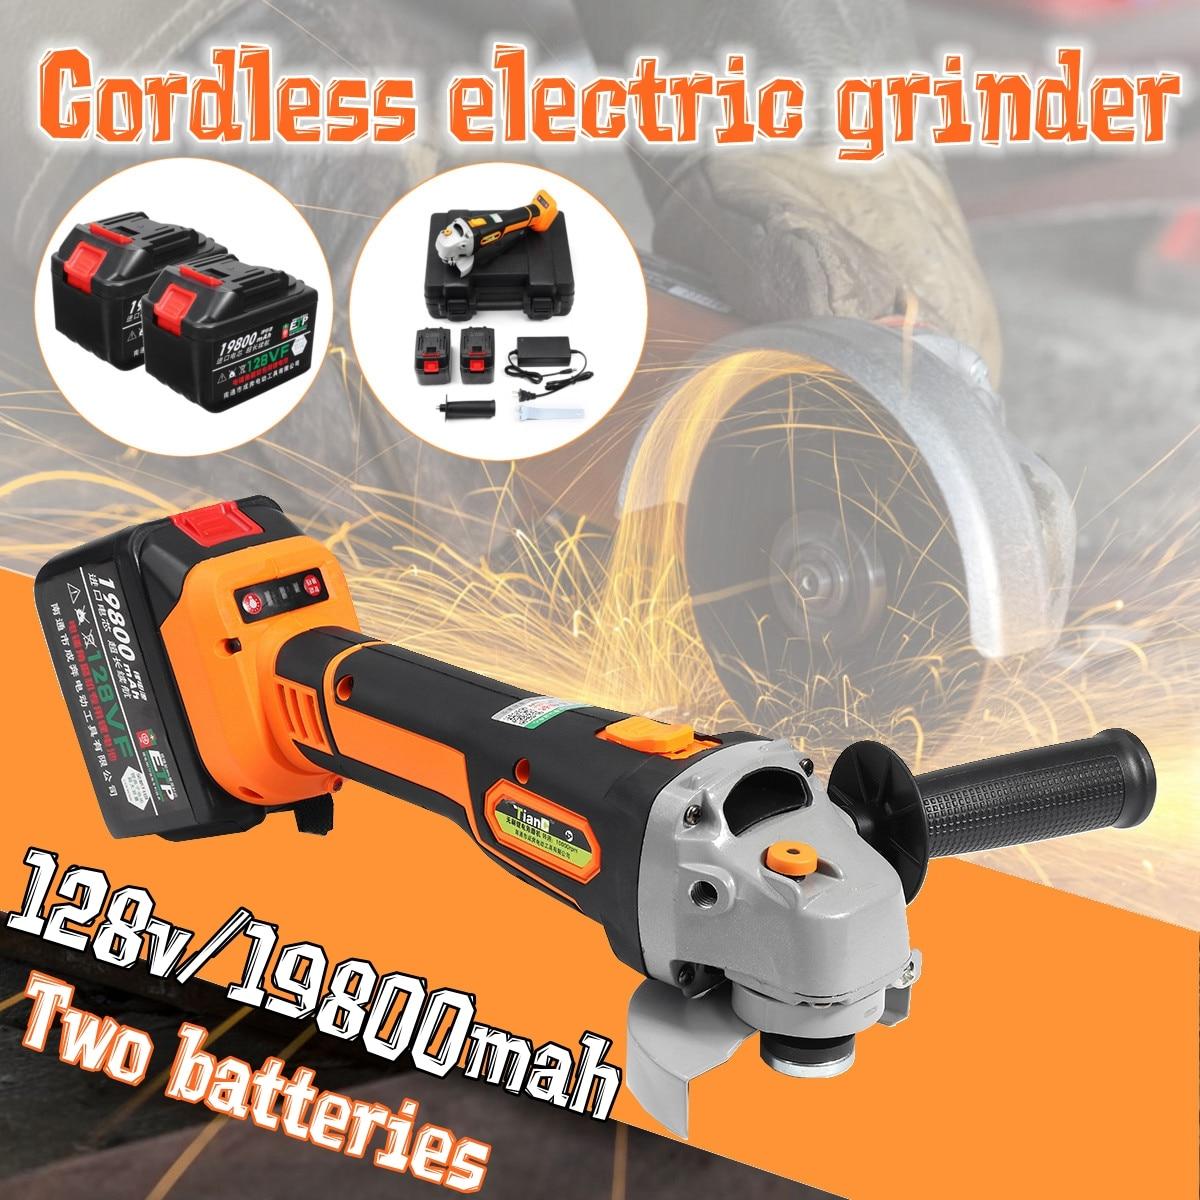 купить 128Vf 19800mAh Electric Angle Grinder Cordless Polisher Polishing Machine Cutting Tool Brushless motor Grinding +1/2 Battery недорого